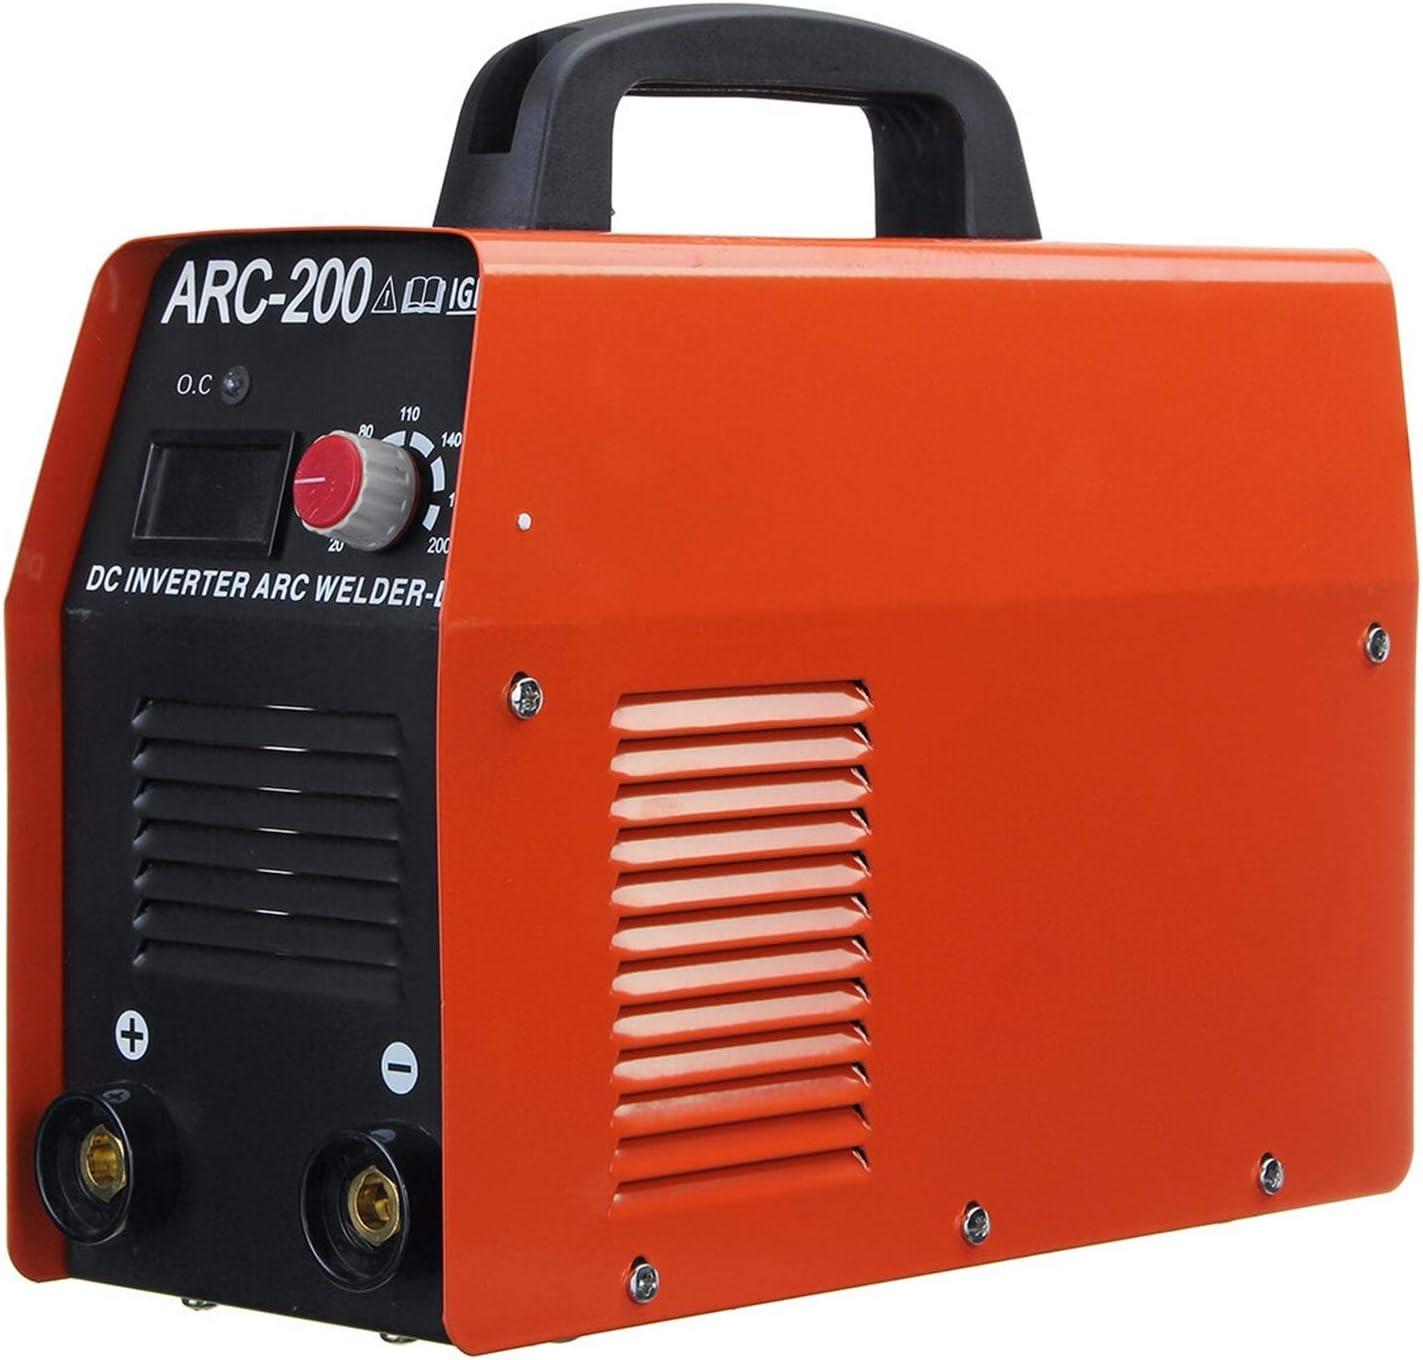 Useful Arc Welding Machine, 220v Arc Welding Machine 200amp Powe